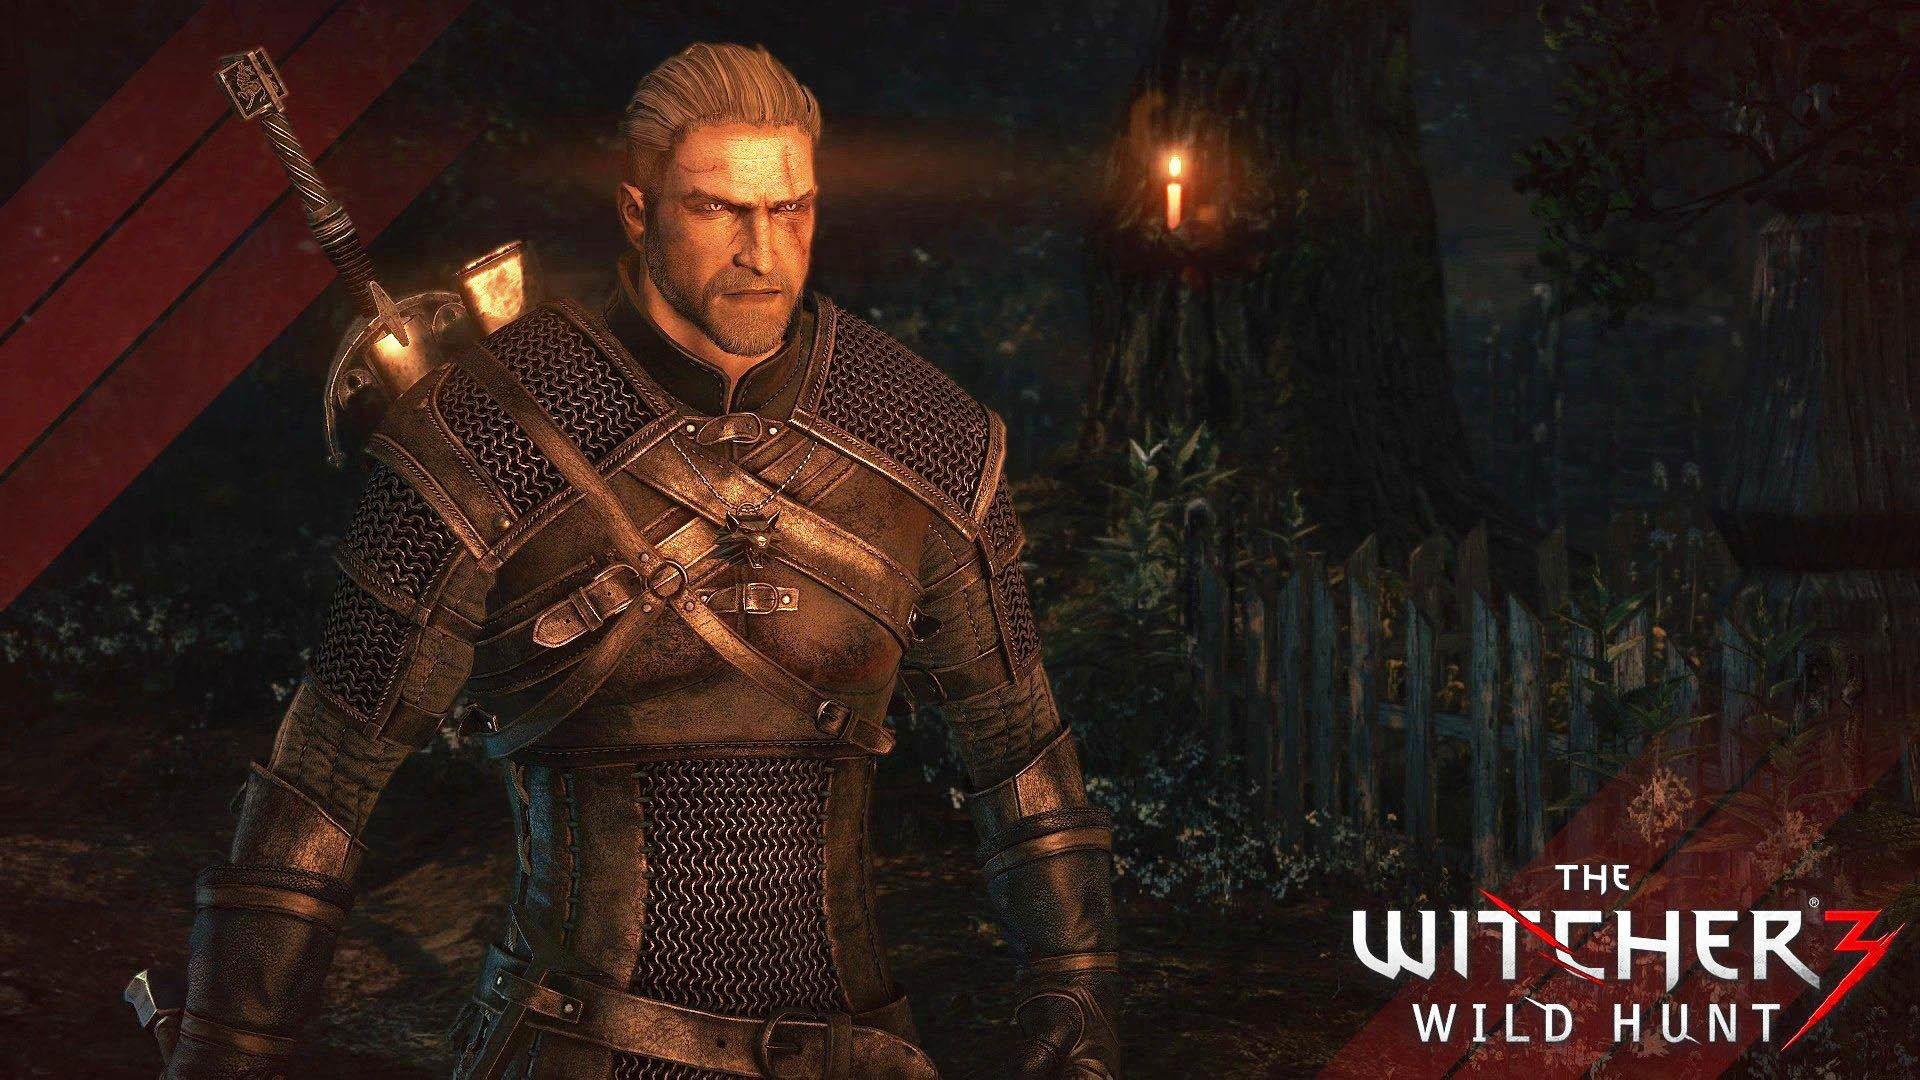 The Witcher 3: Wild Hunt Official Screenshot wallpaper